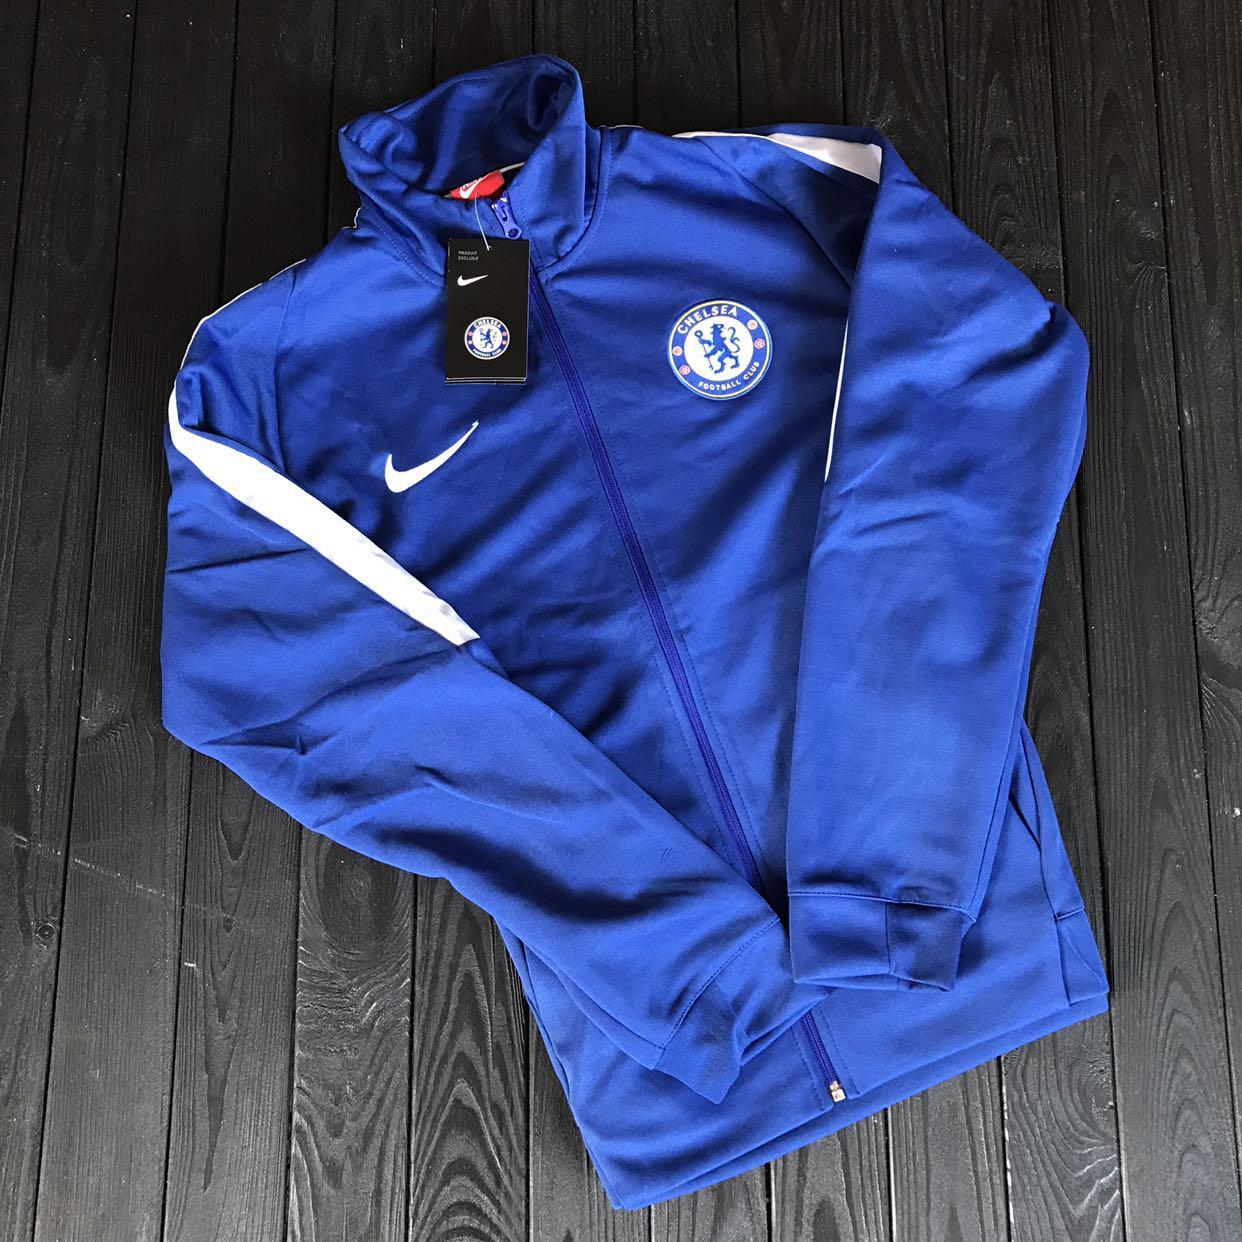 Спортивная (тренировочная ) кофта Челси (Chelsea) 2018-2019 сезона - Sport  Exclusive e8641c49363